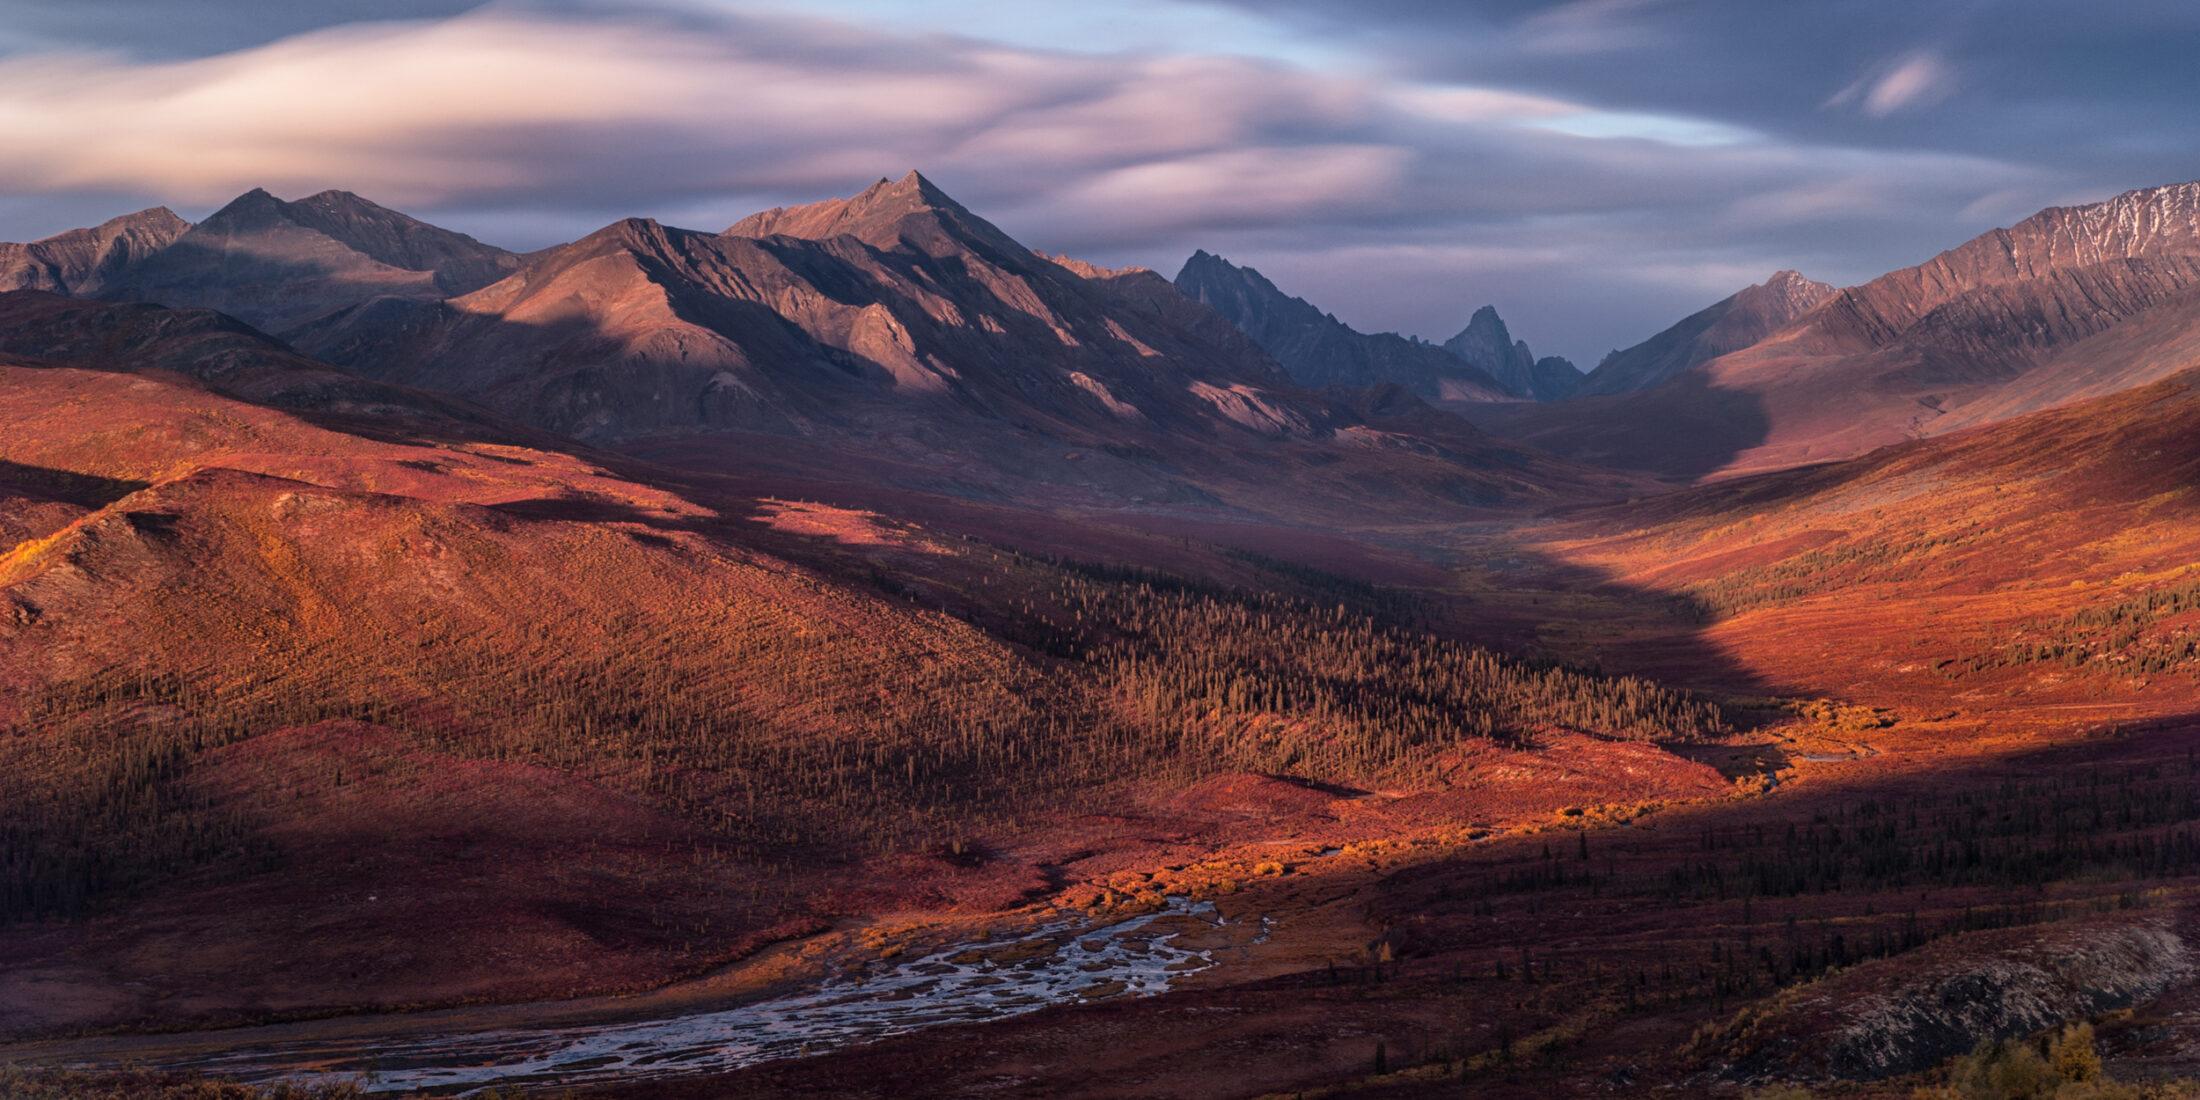 mountain range at sunset